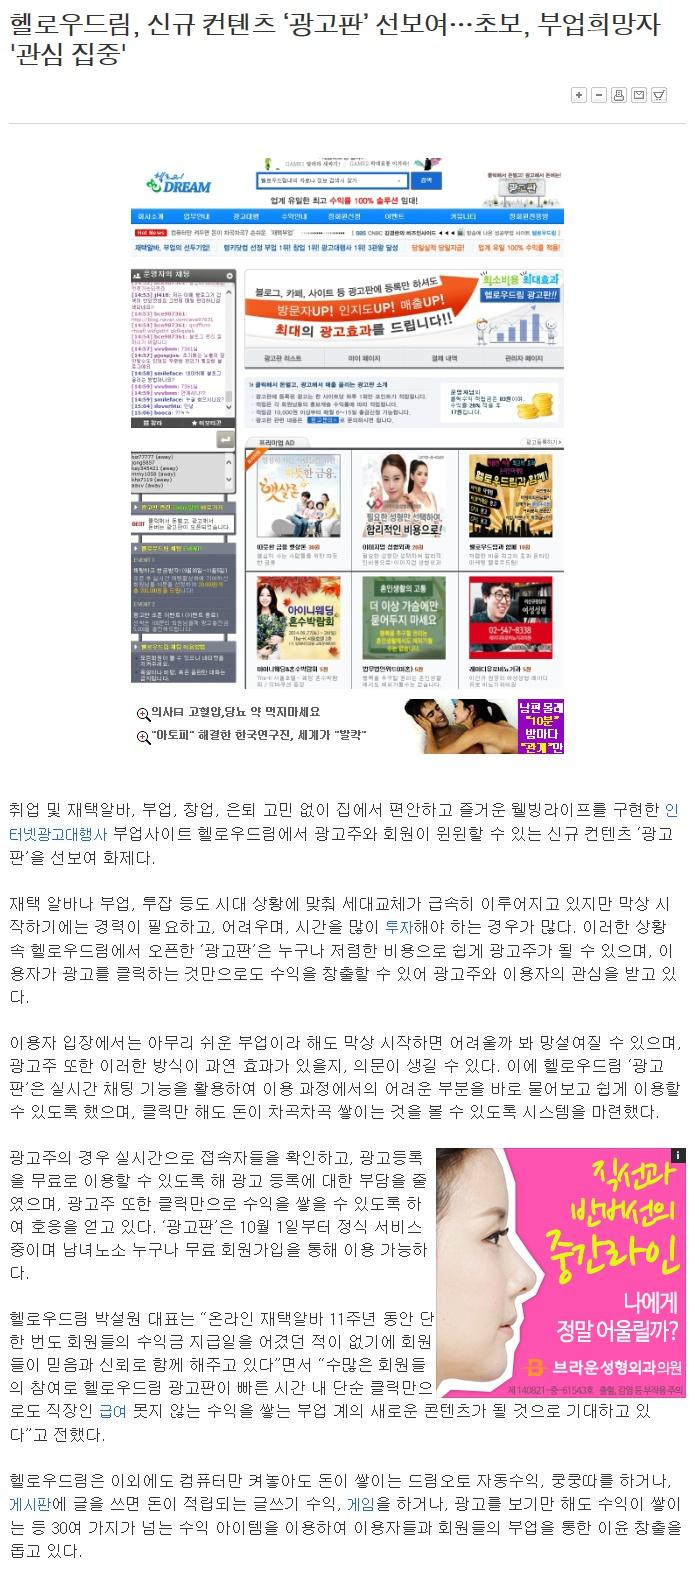 sportsworldi_com_20141002_180150.jpg